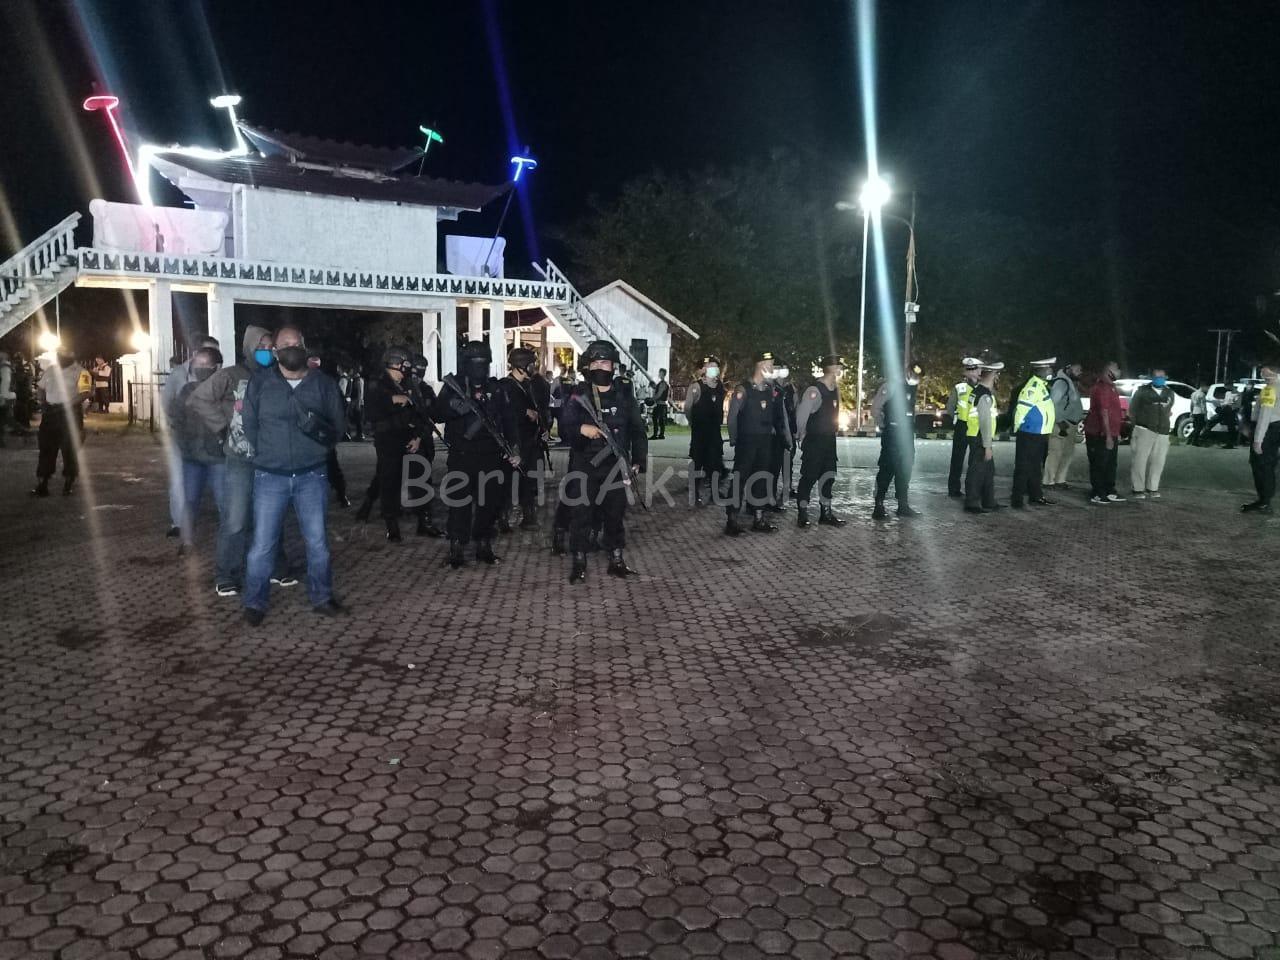 Polda PB Siapkan 317 Personil Buru Pelaku Kejahatan di Manokwari 26 IMG 20200426 WA0060